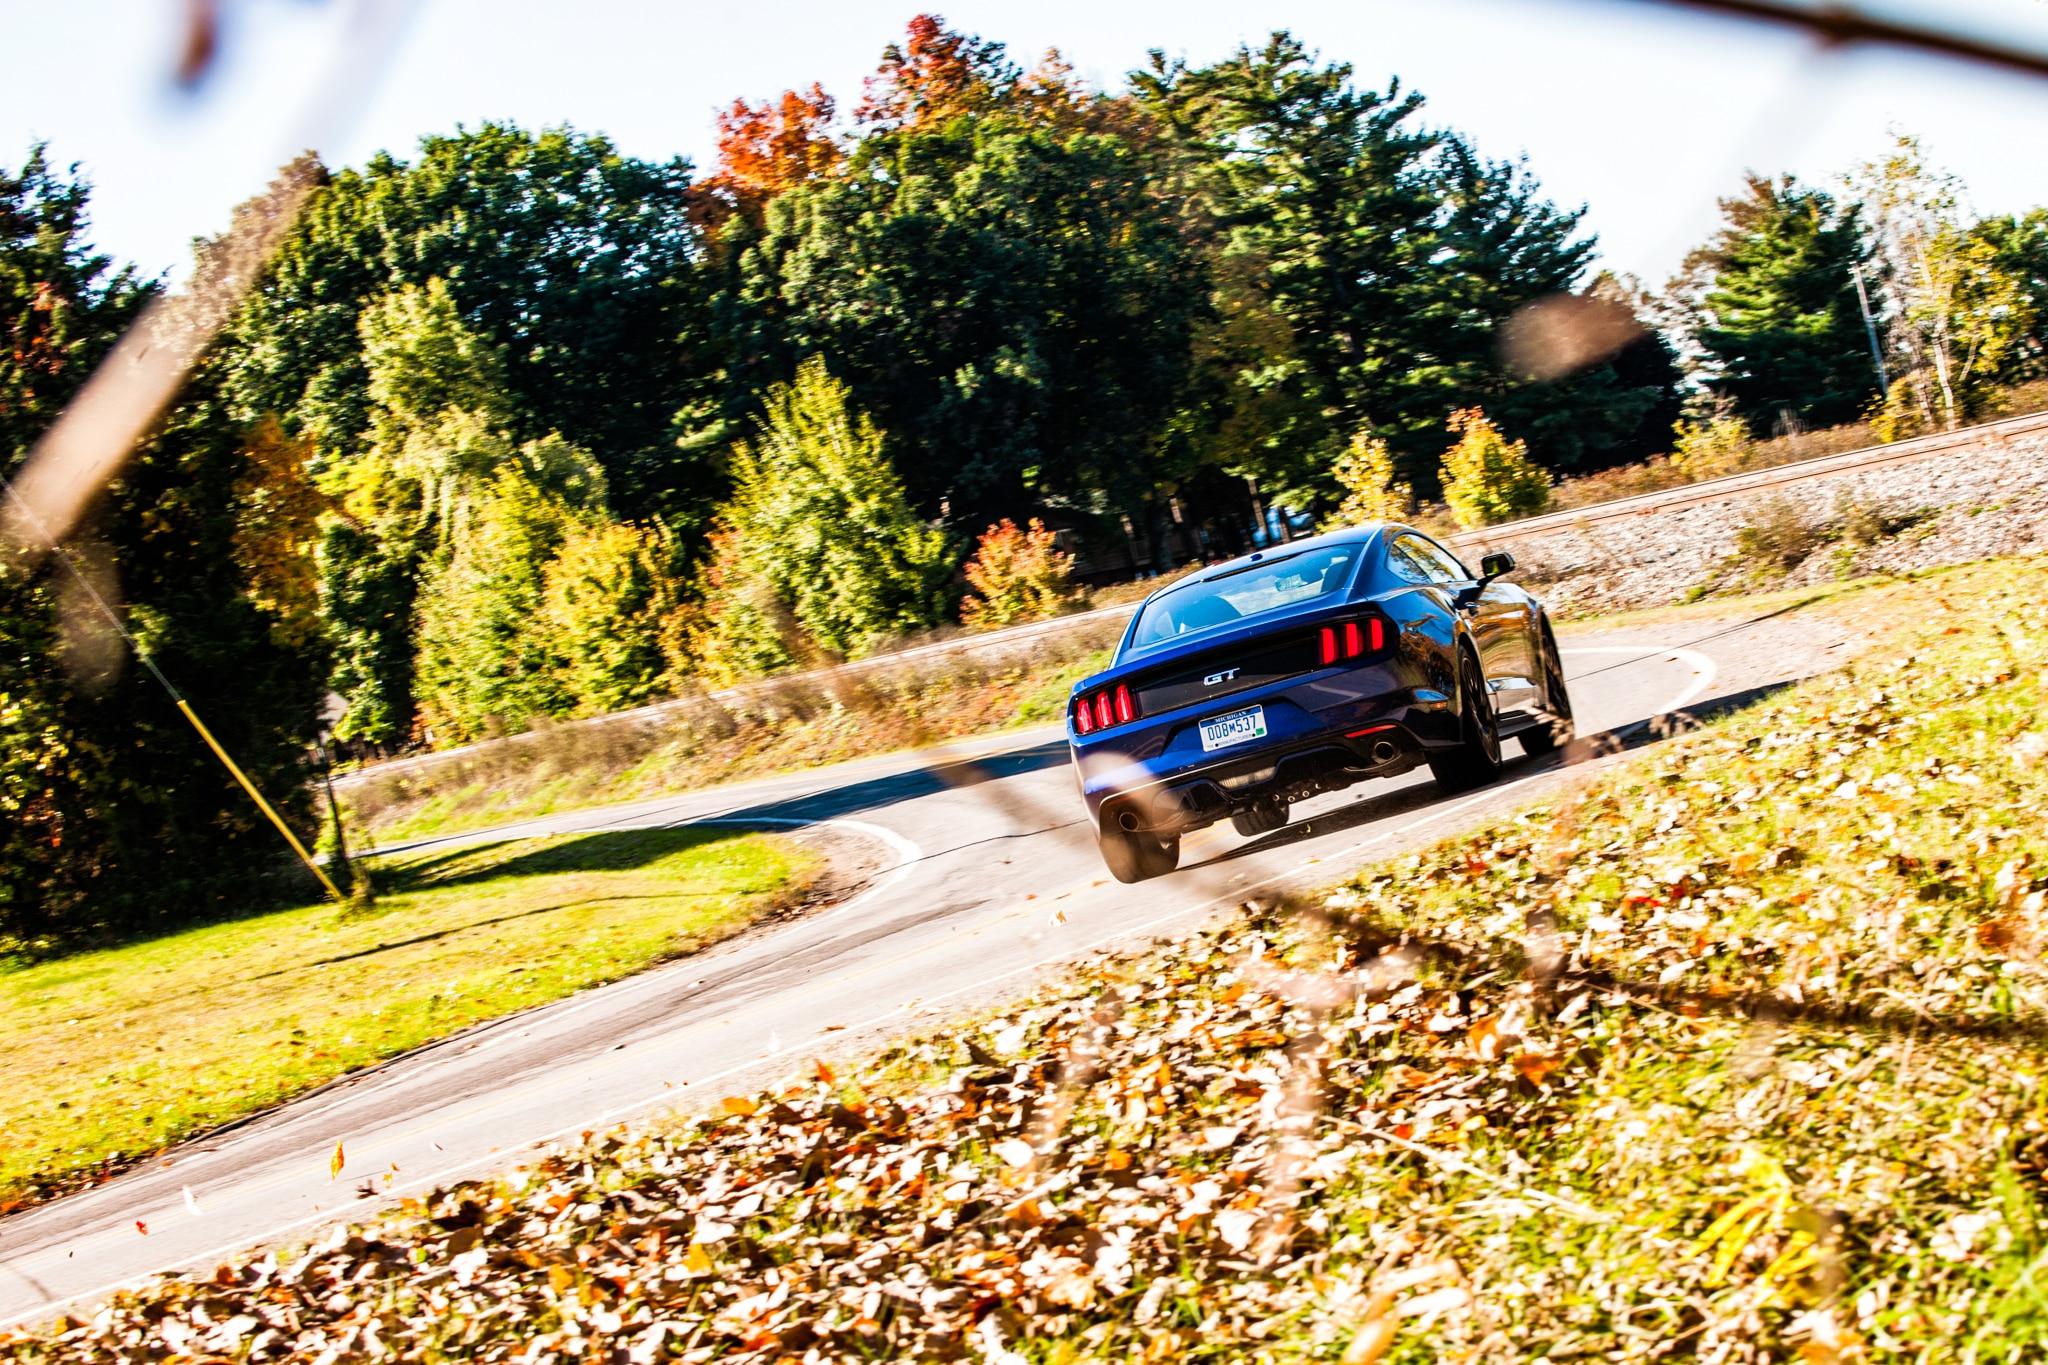 Ford Mustang 2015 Automobile All Star Magazine Go Back Gt Pix For Snake Skeleton Diagram Show More